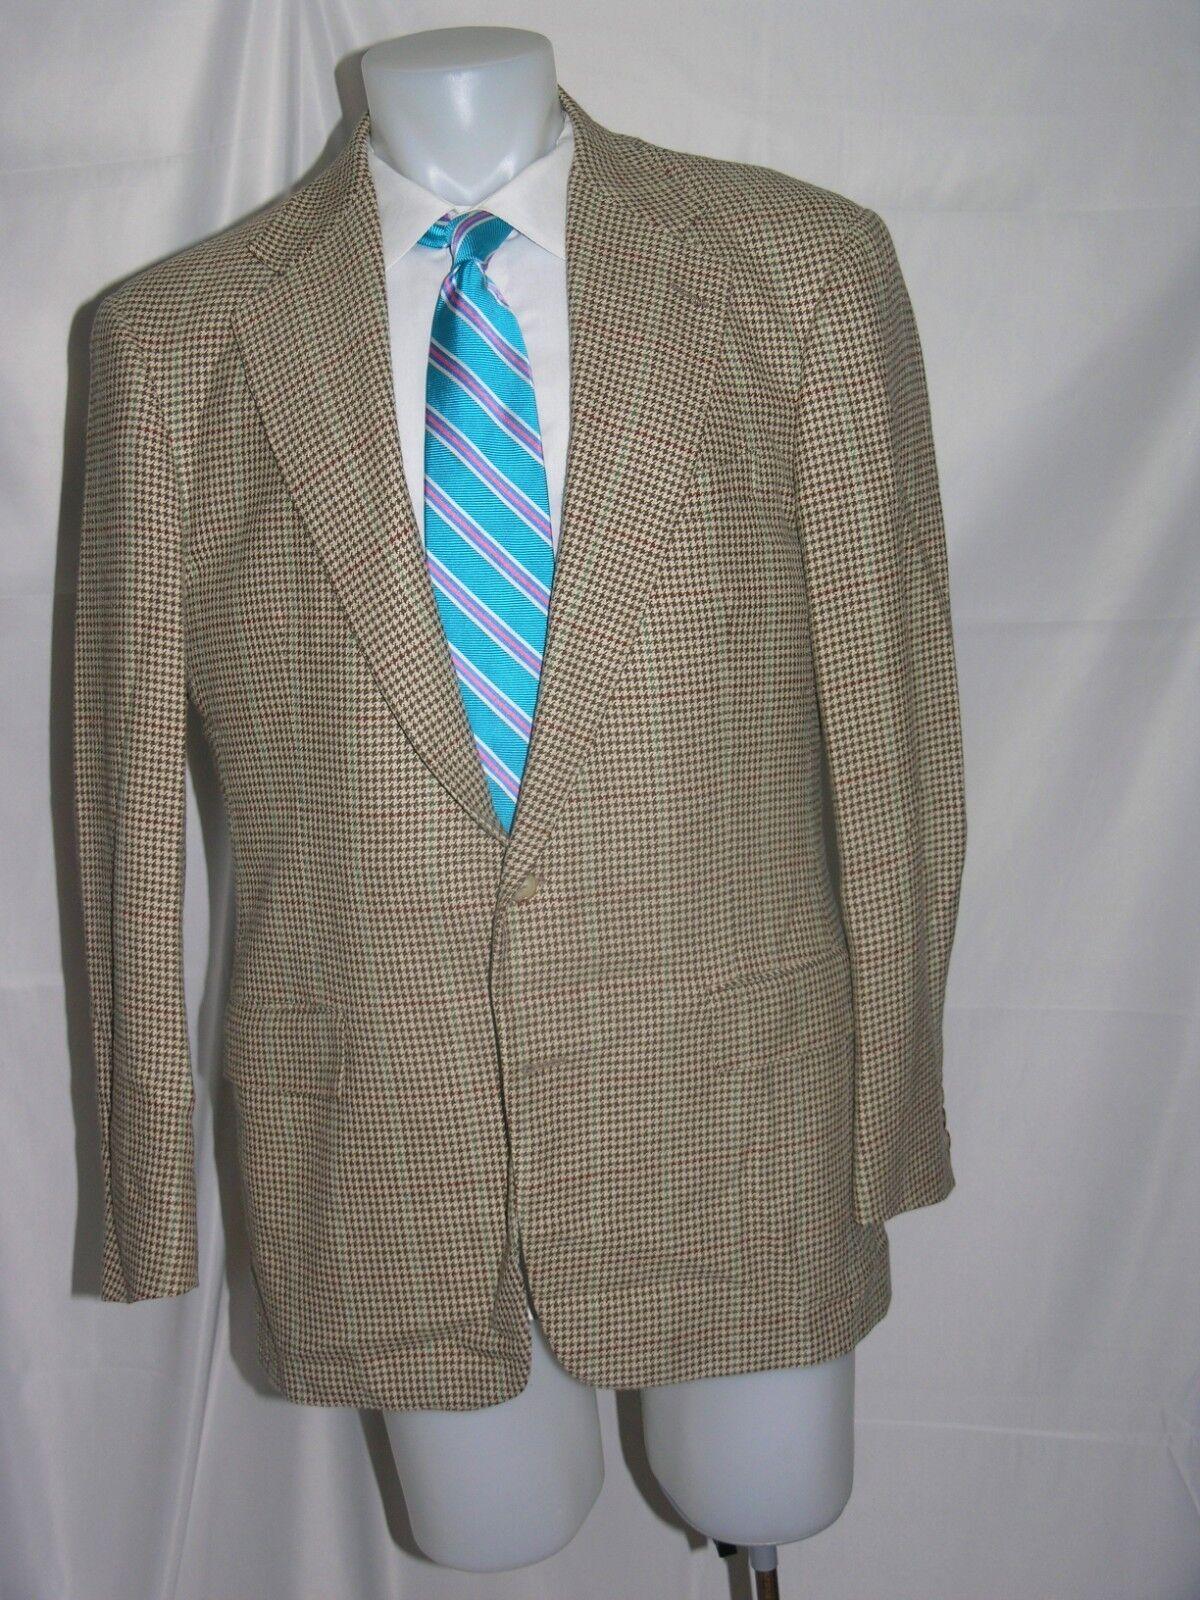 Polo Ralph Lauren bluee Label Vintage  Two Button 100% Silk Blazer 41 L